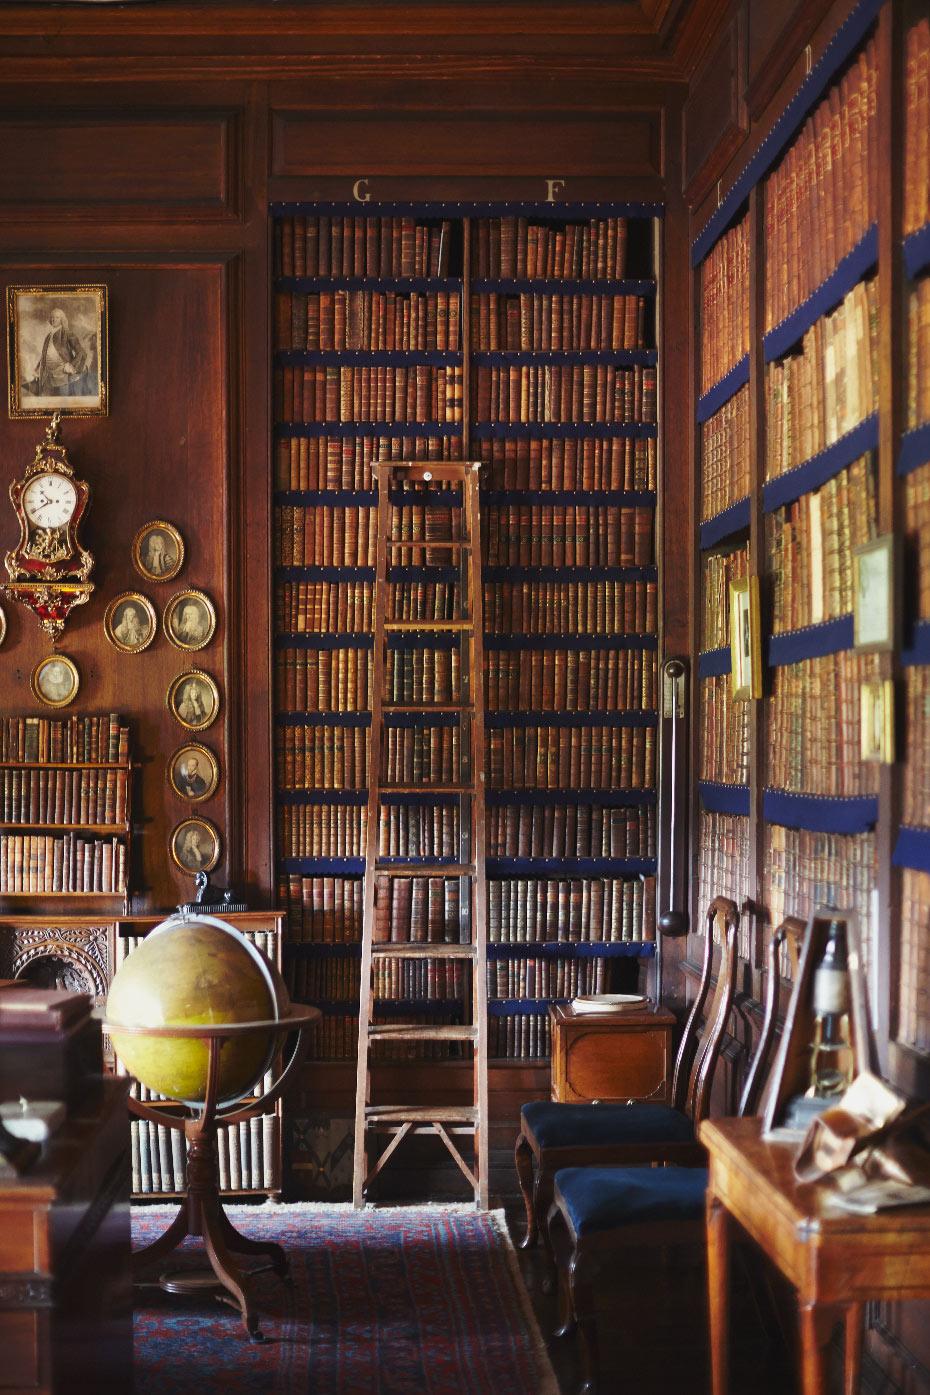 Stacey Van Berkel Photography I Beautiful library full of vintage books I Erddig Hall I Wrexham, Wales